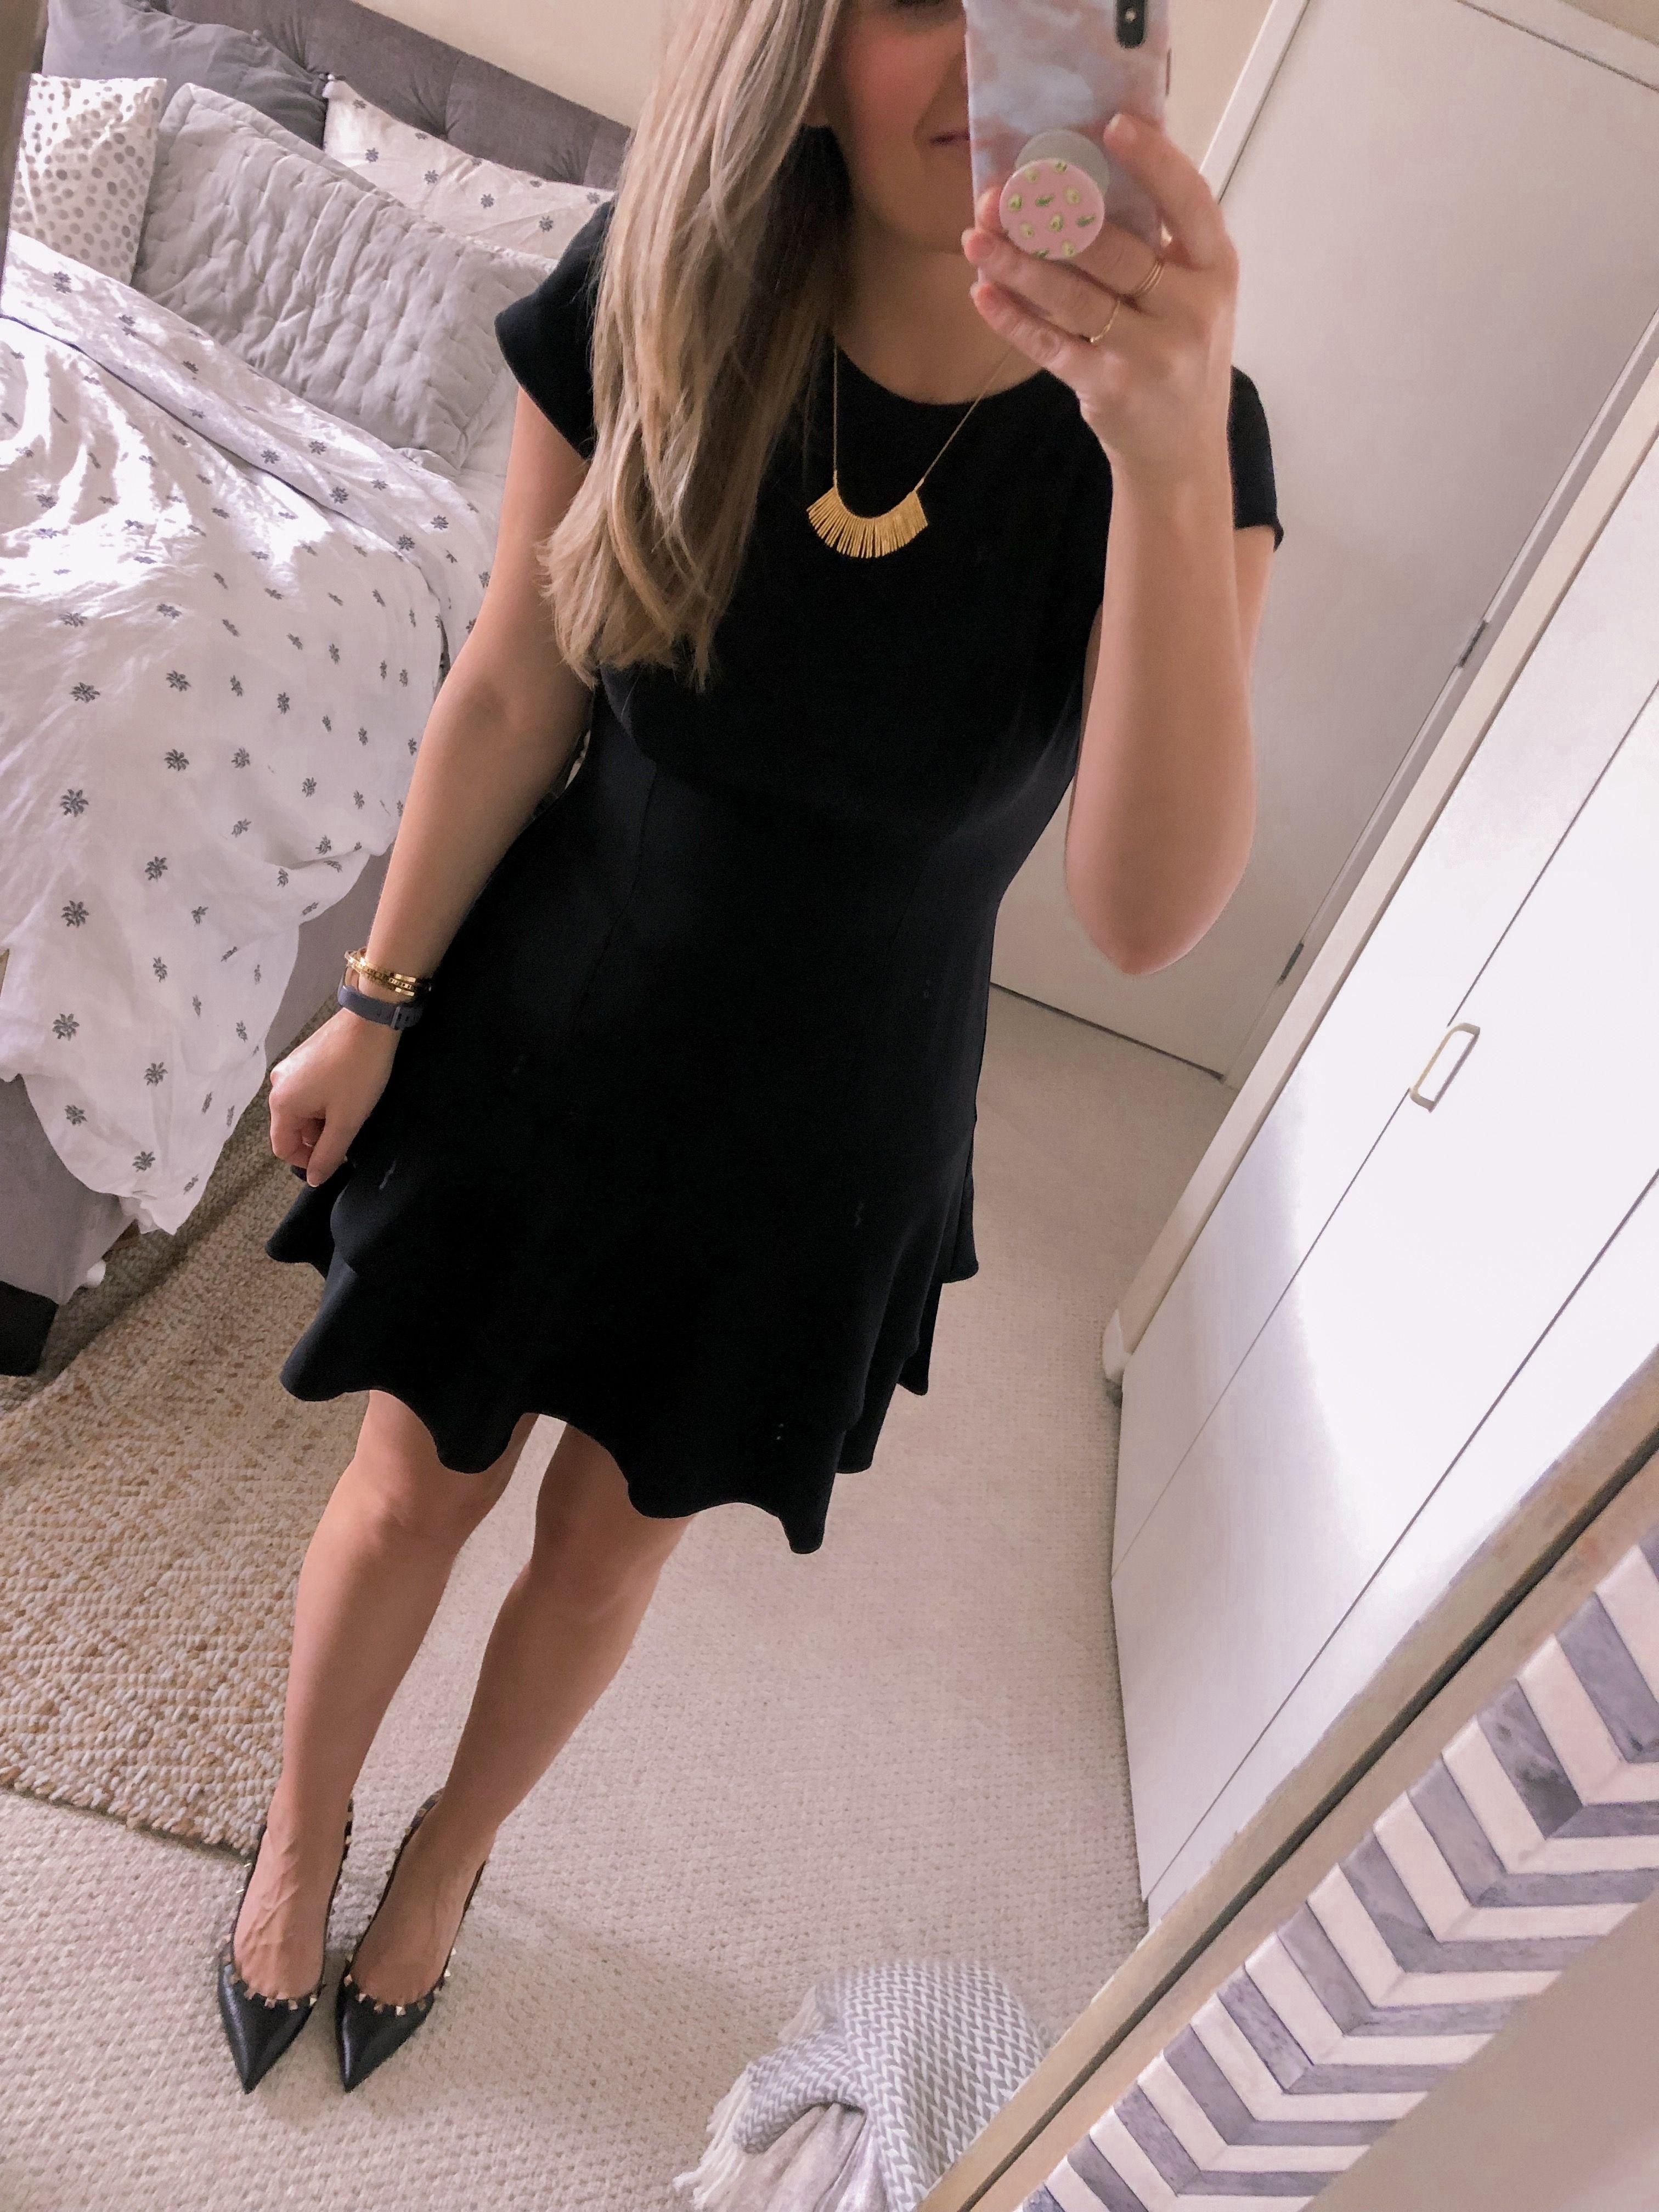 Ootd 1 15 19 Black Dress Visions Of Vogue All Black Dresses Black Dress All Black Dress Outfit [ 4032 x 3024 Pixel ]